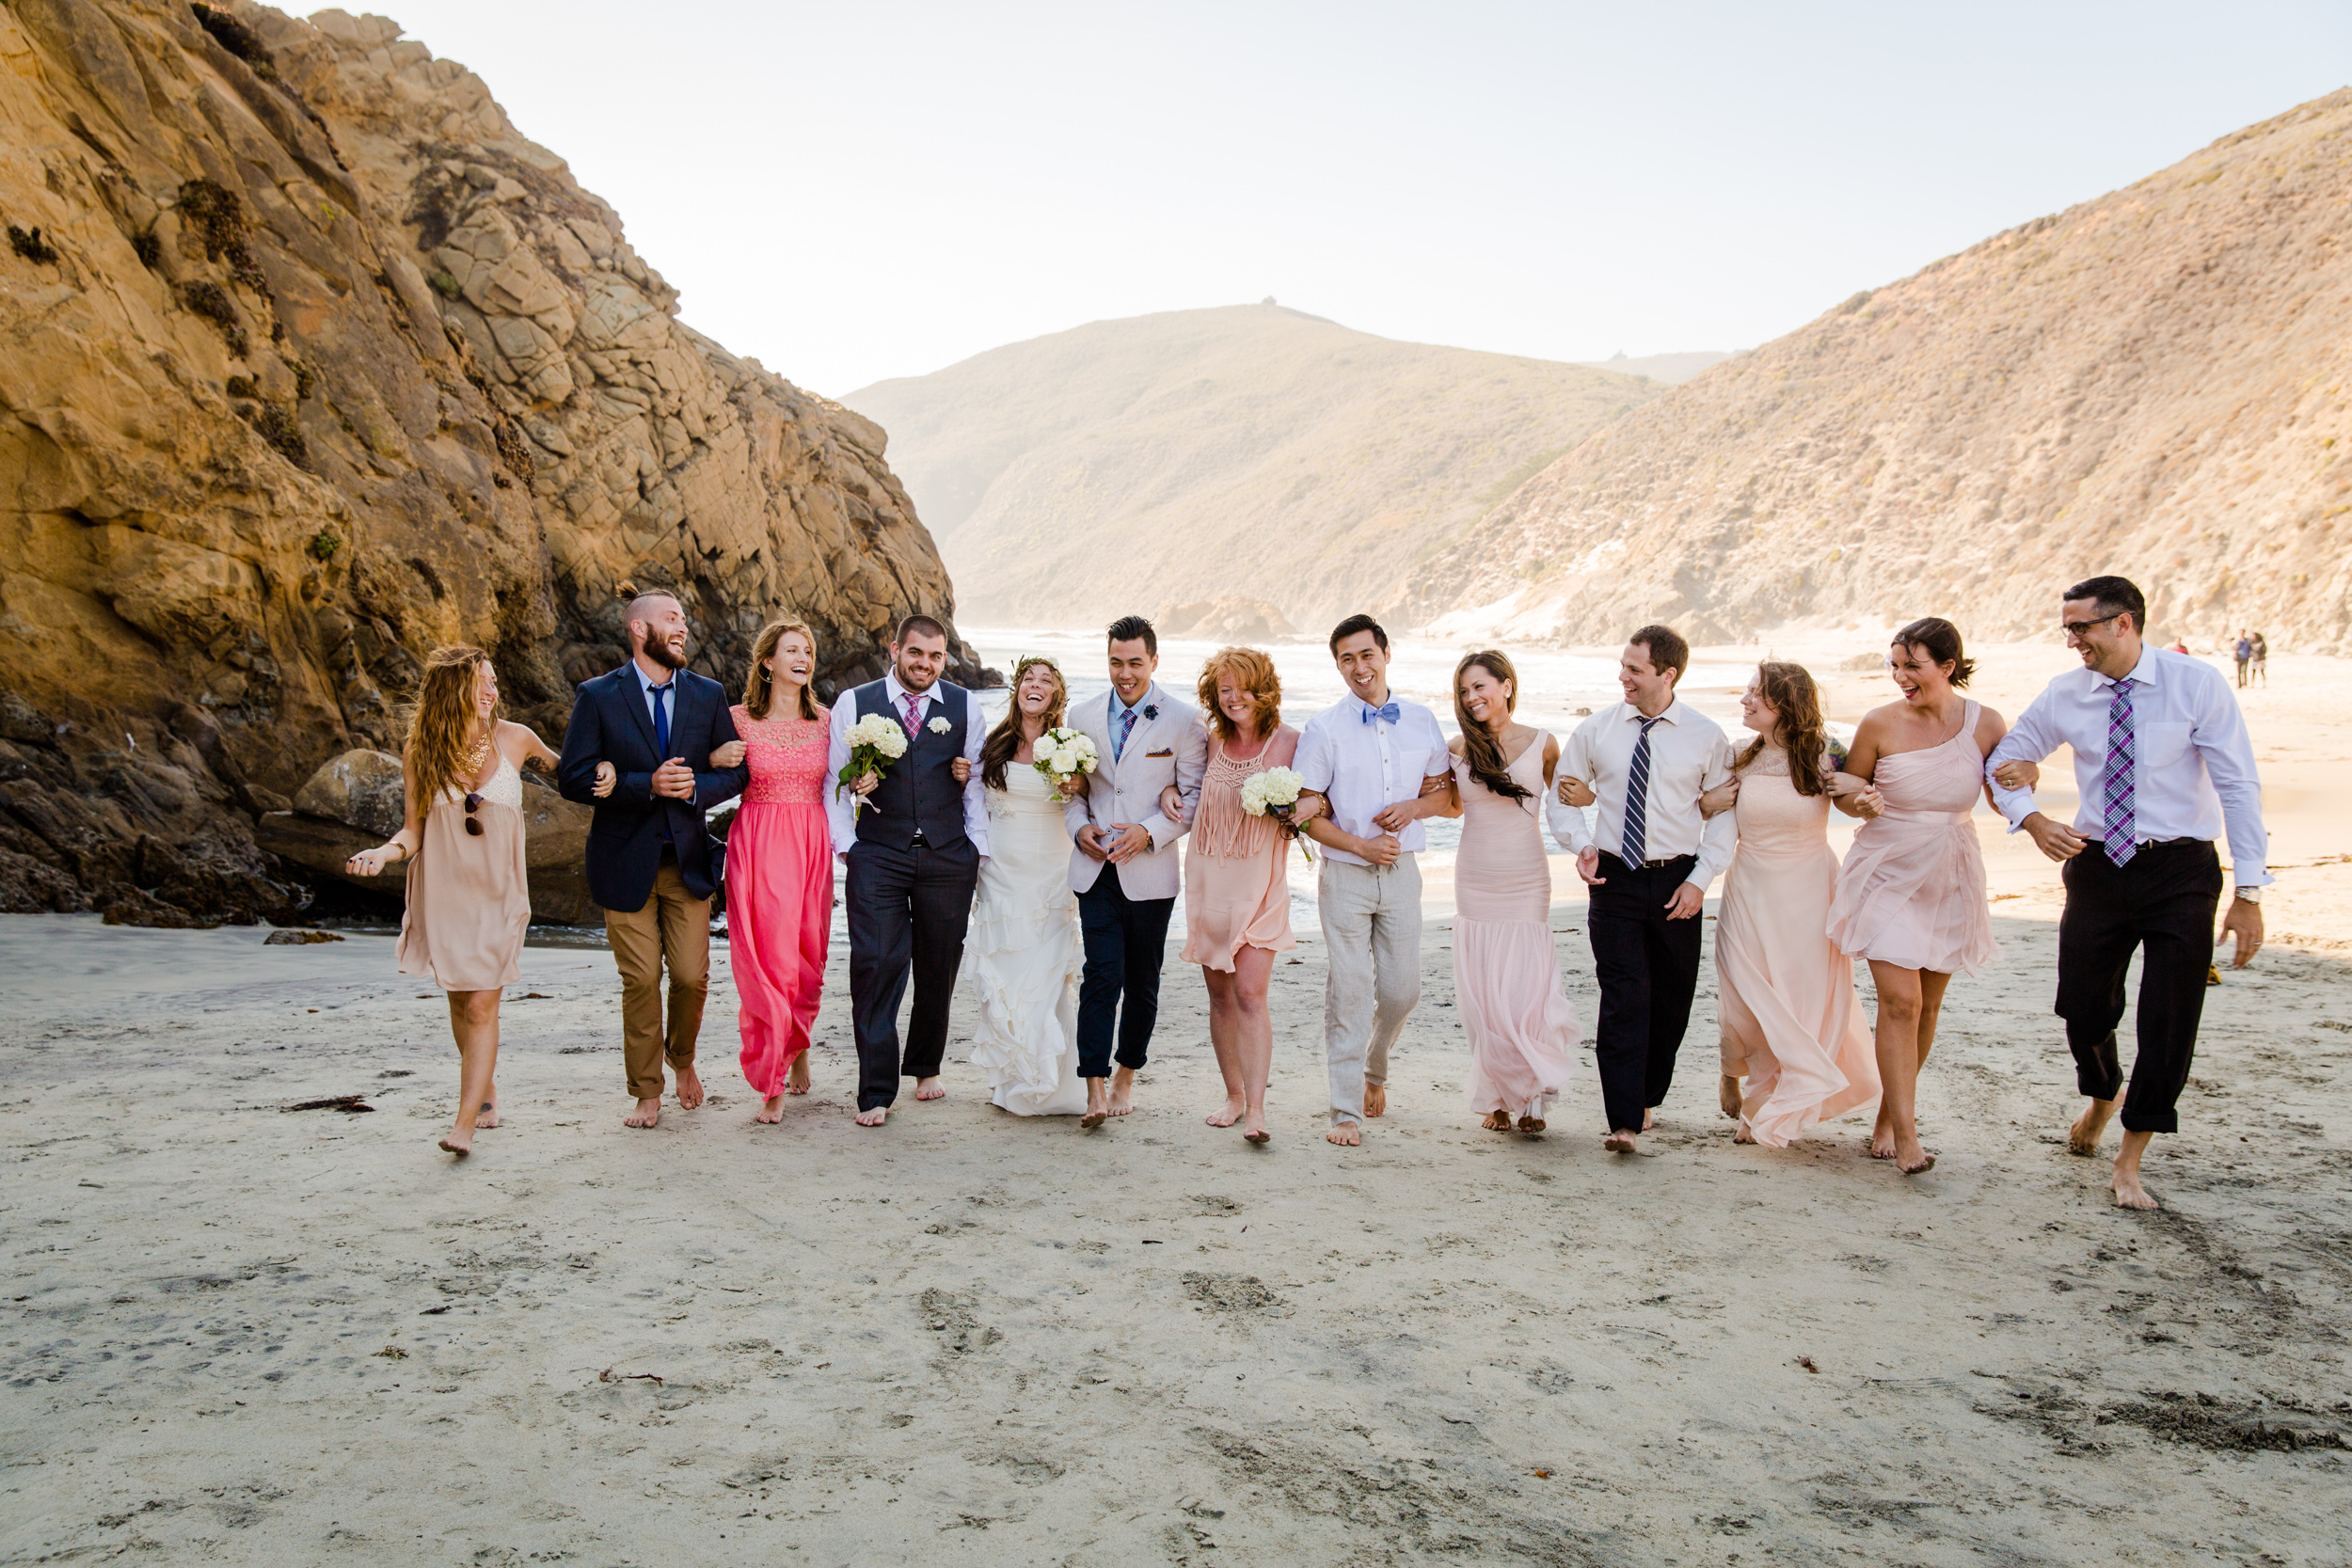 39--jewel-maree-photography-wedding.jpg